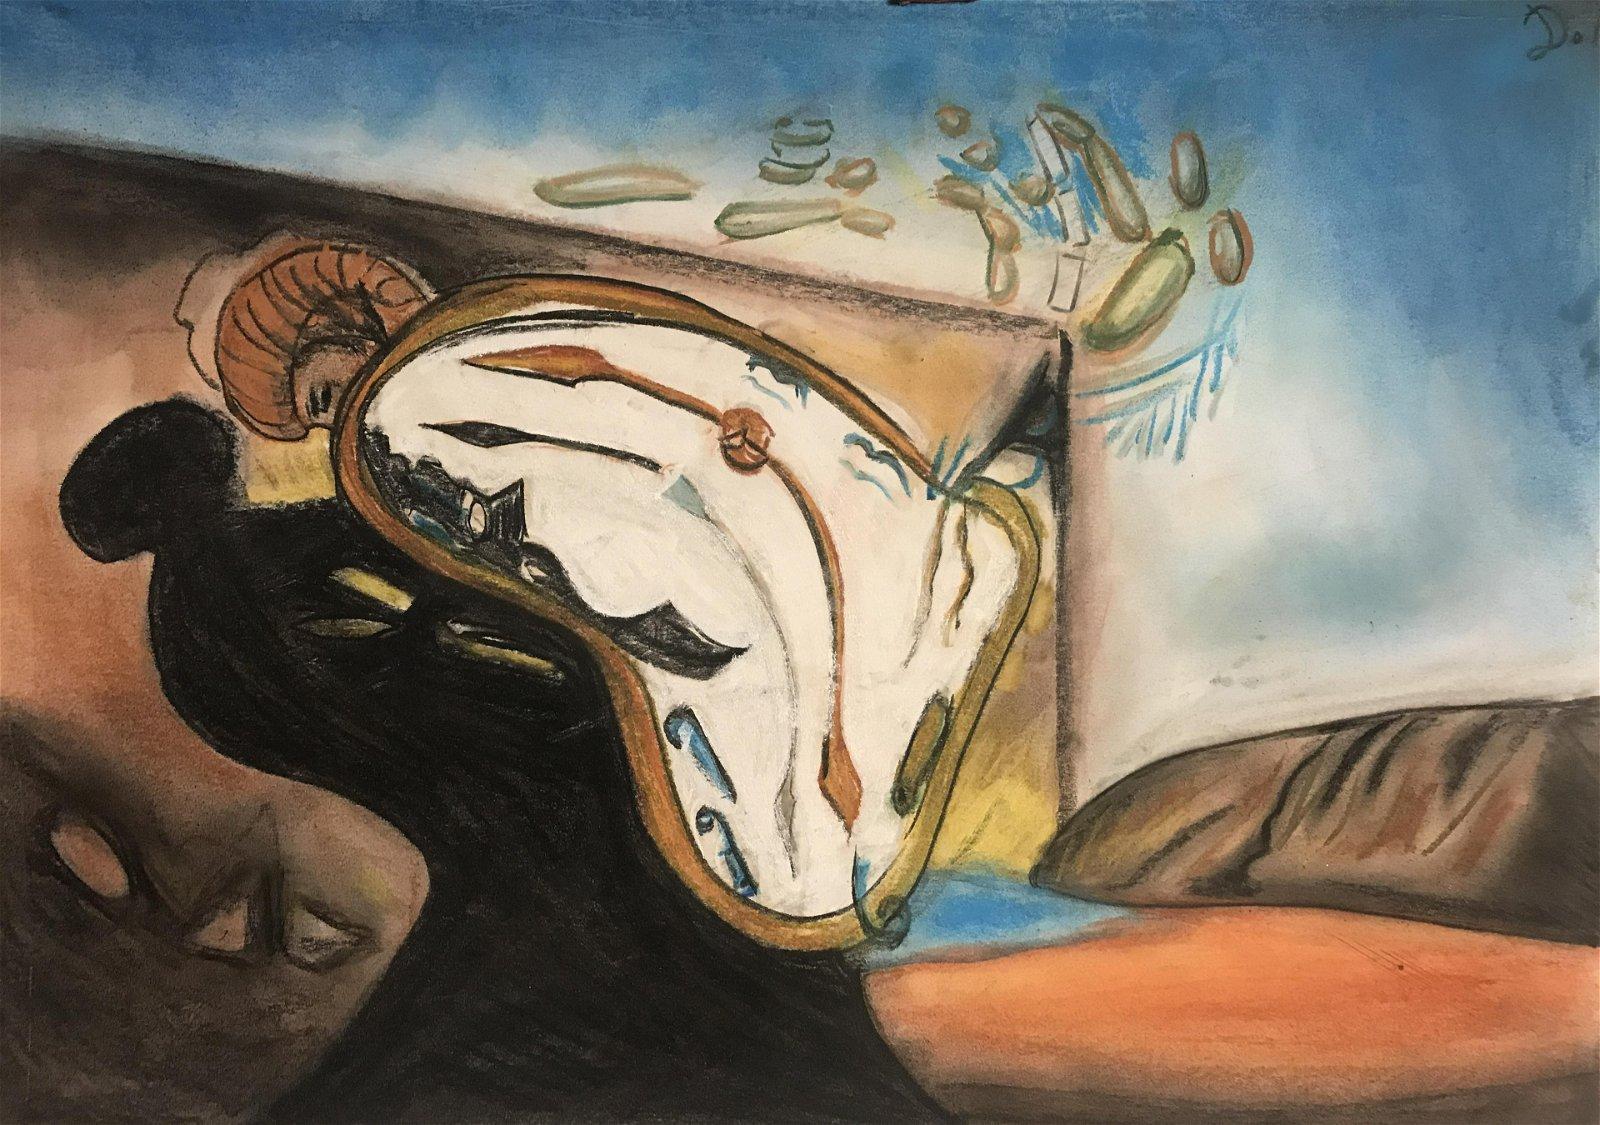 Relojes Blandos , in the style of Salvador Dali , , Sep 12